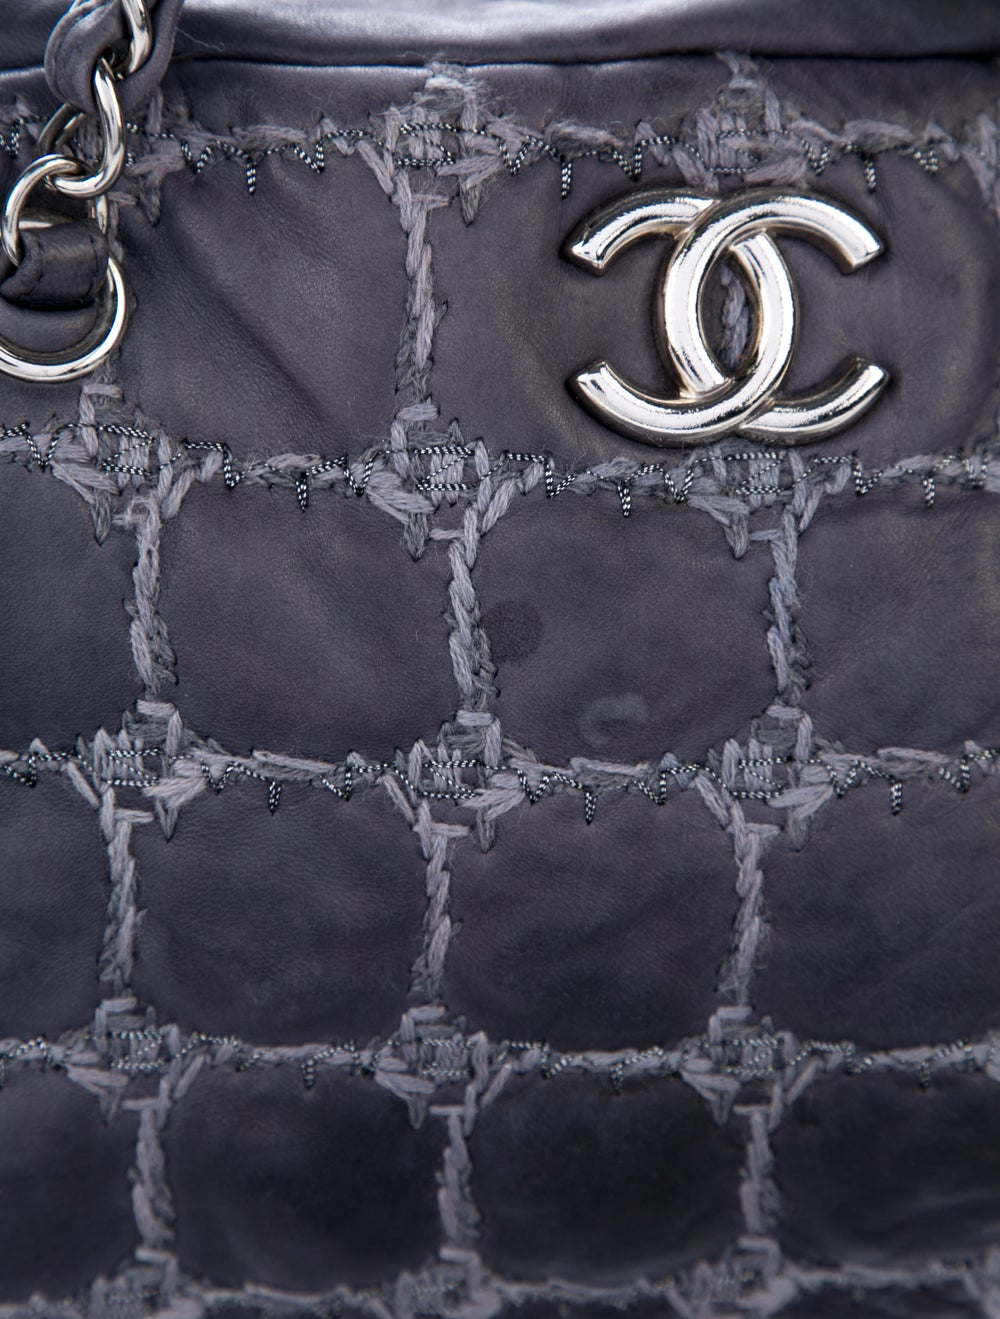 Chanel Tweed Stitch Bowler Bag Blue - image 6